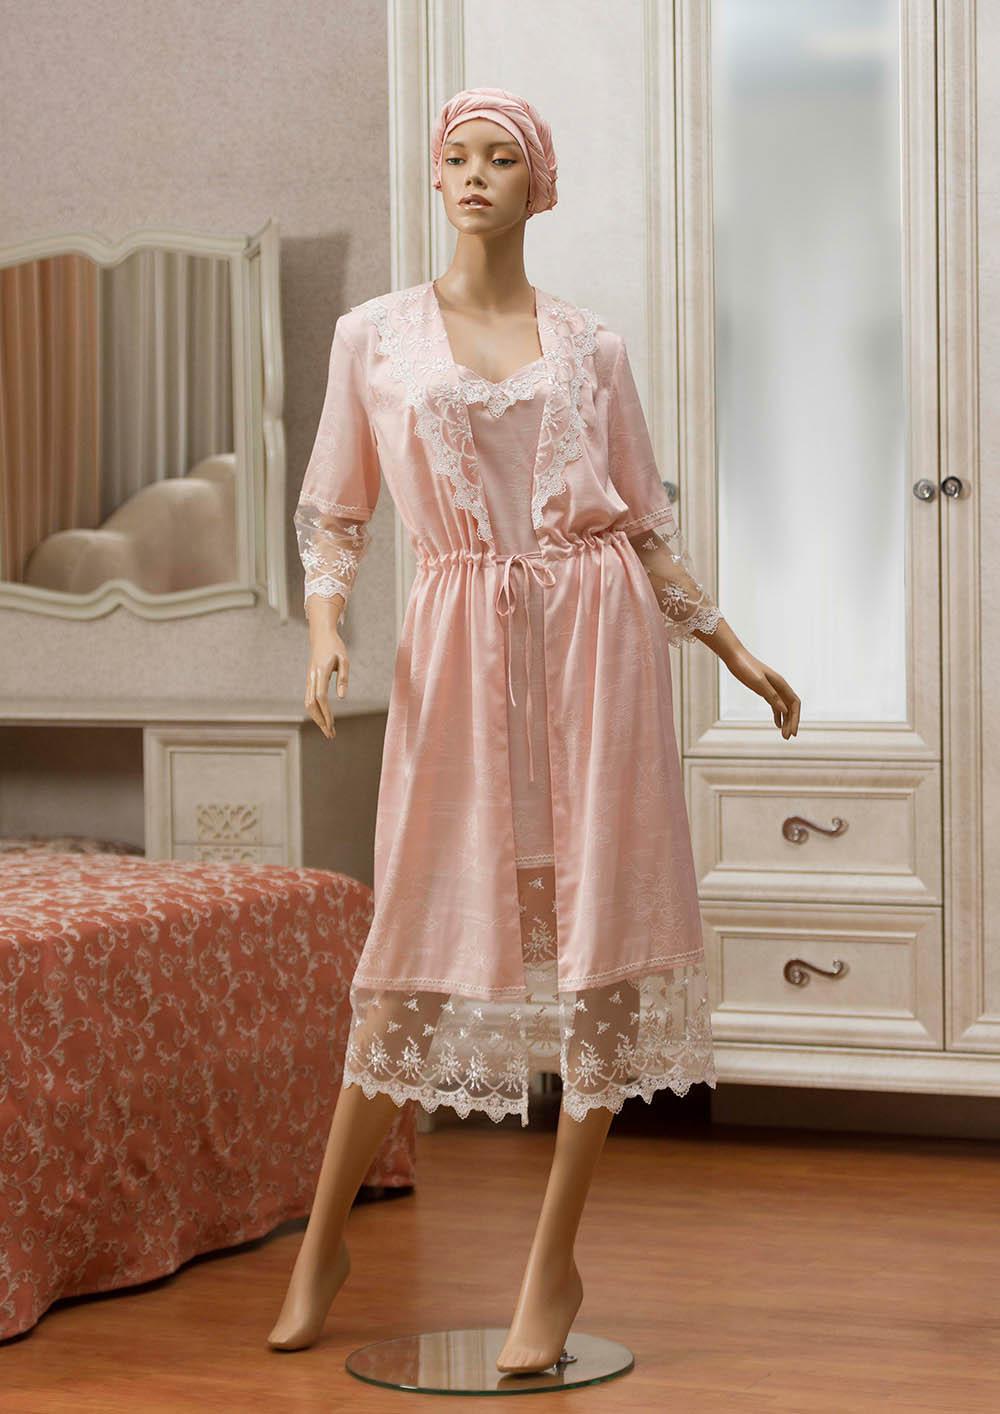 Домашние халаты Primavelle Домашний халат Lavole Цвет: Розовый (L-xL) домашние халаты vivien домашний халат funny l